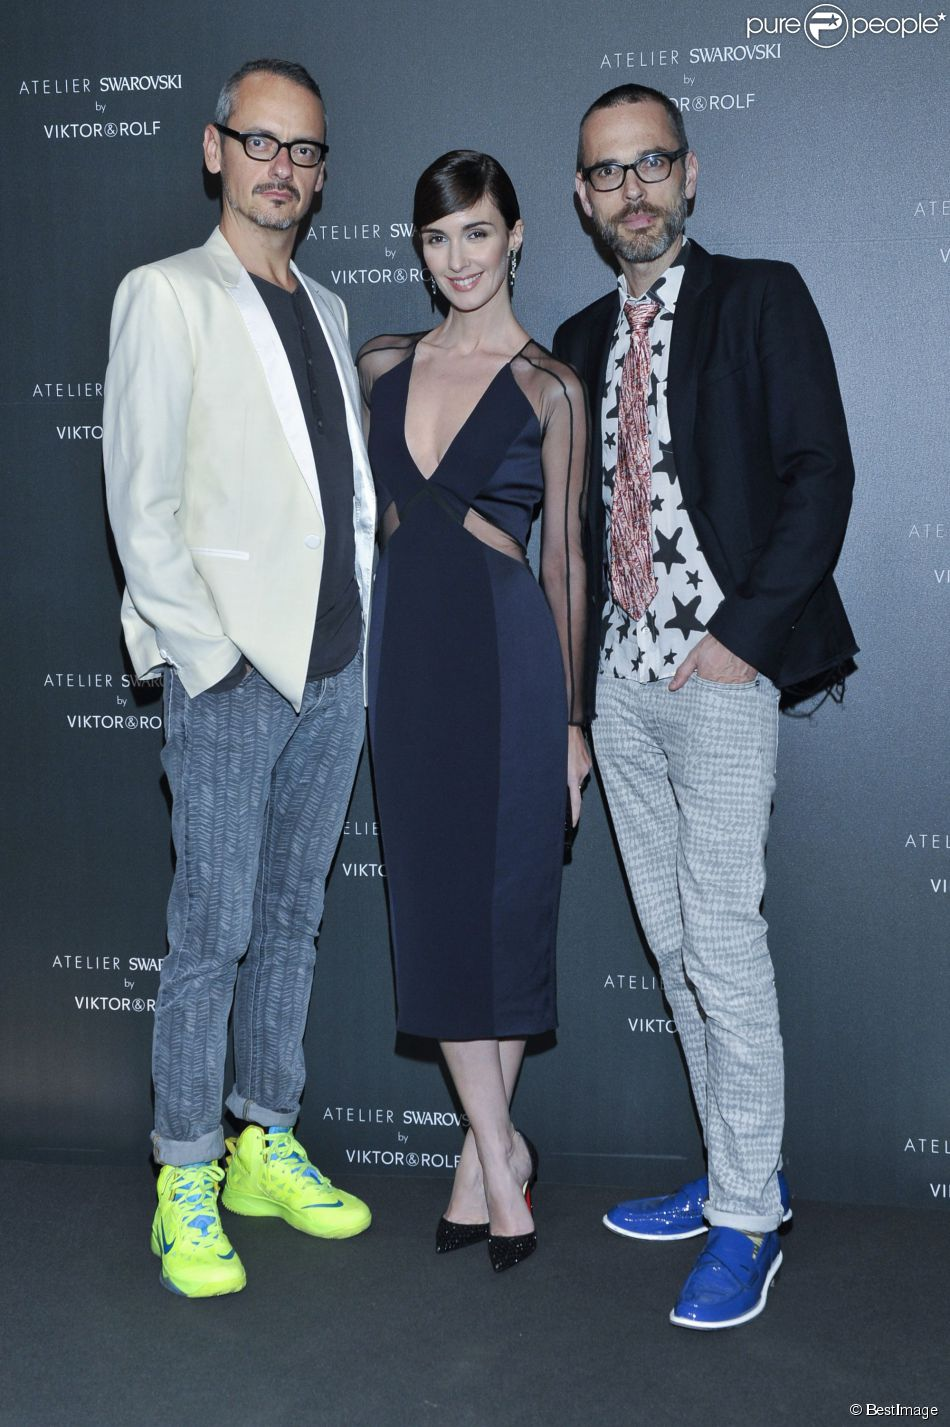 Paz Vega entre Viktor & Rolf - Soirée Swarovski et Viktor & Rolf à l'Ecrin lors du 67e Festival international du film de Cannes, le 16 mai 2014